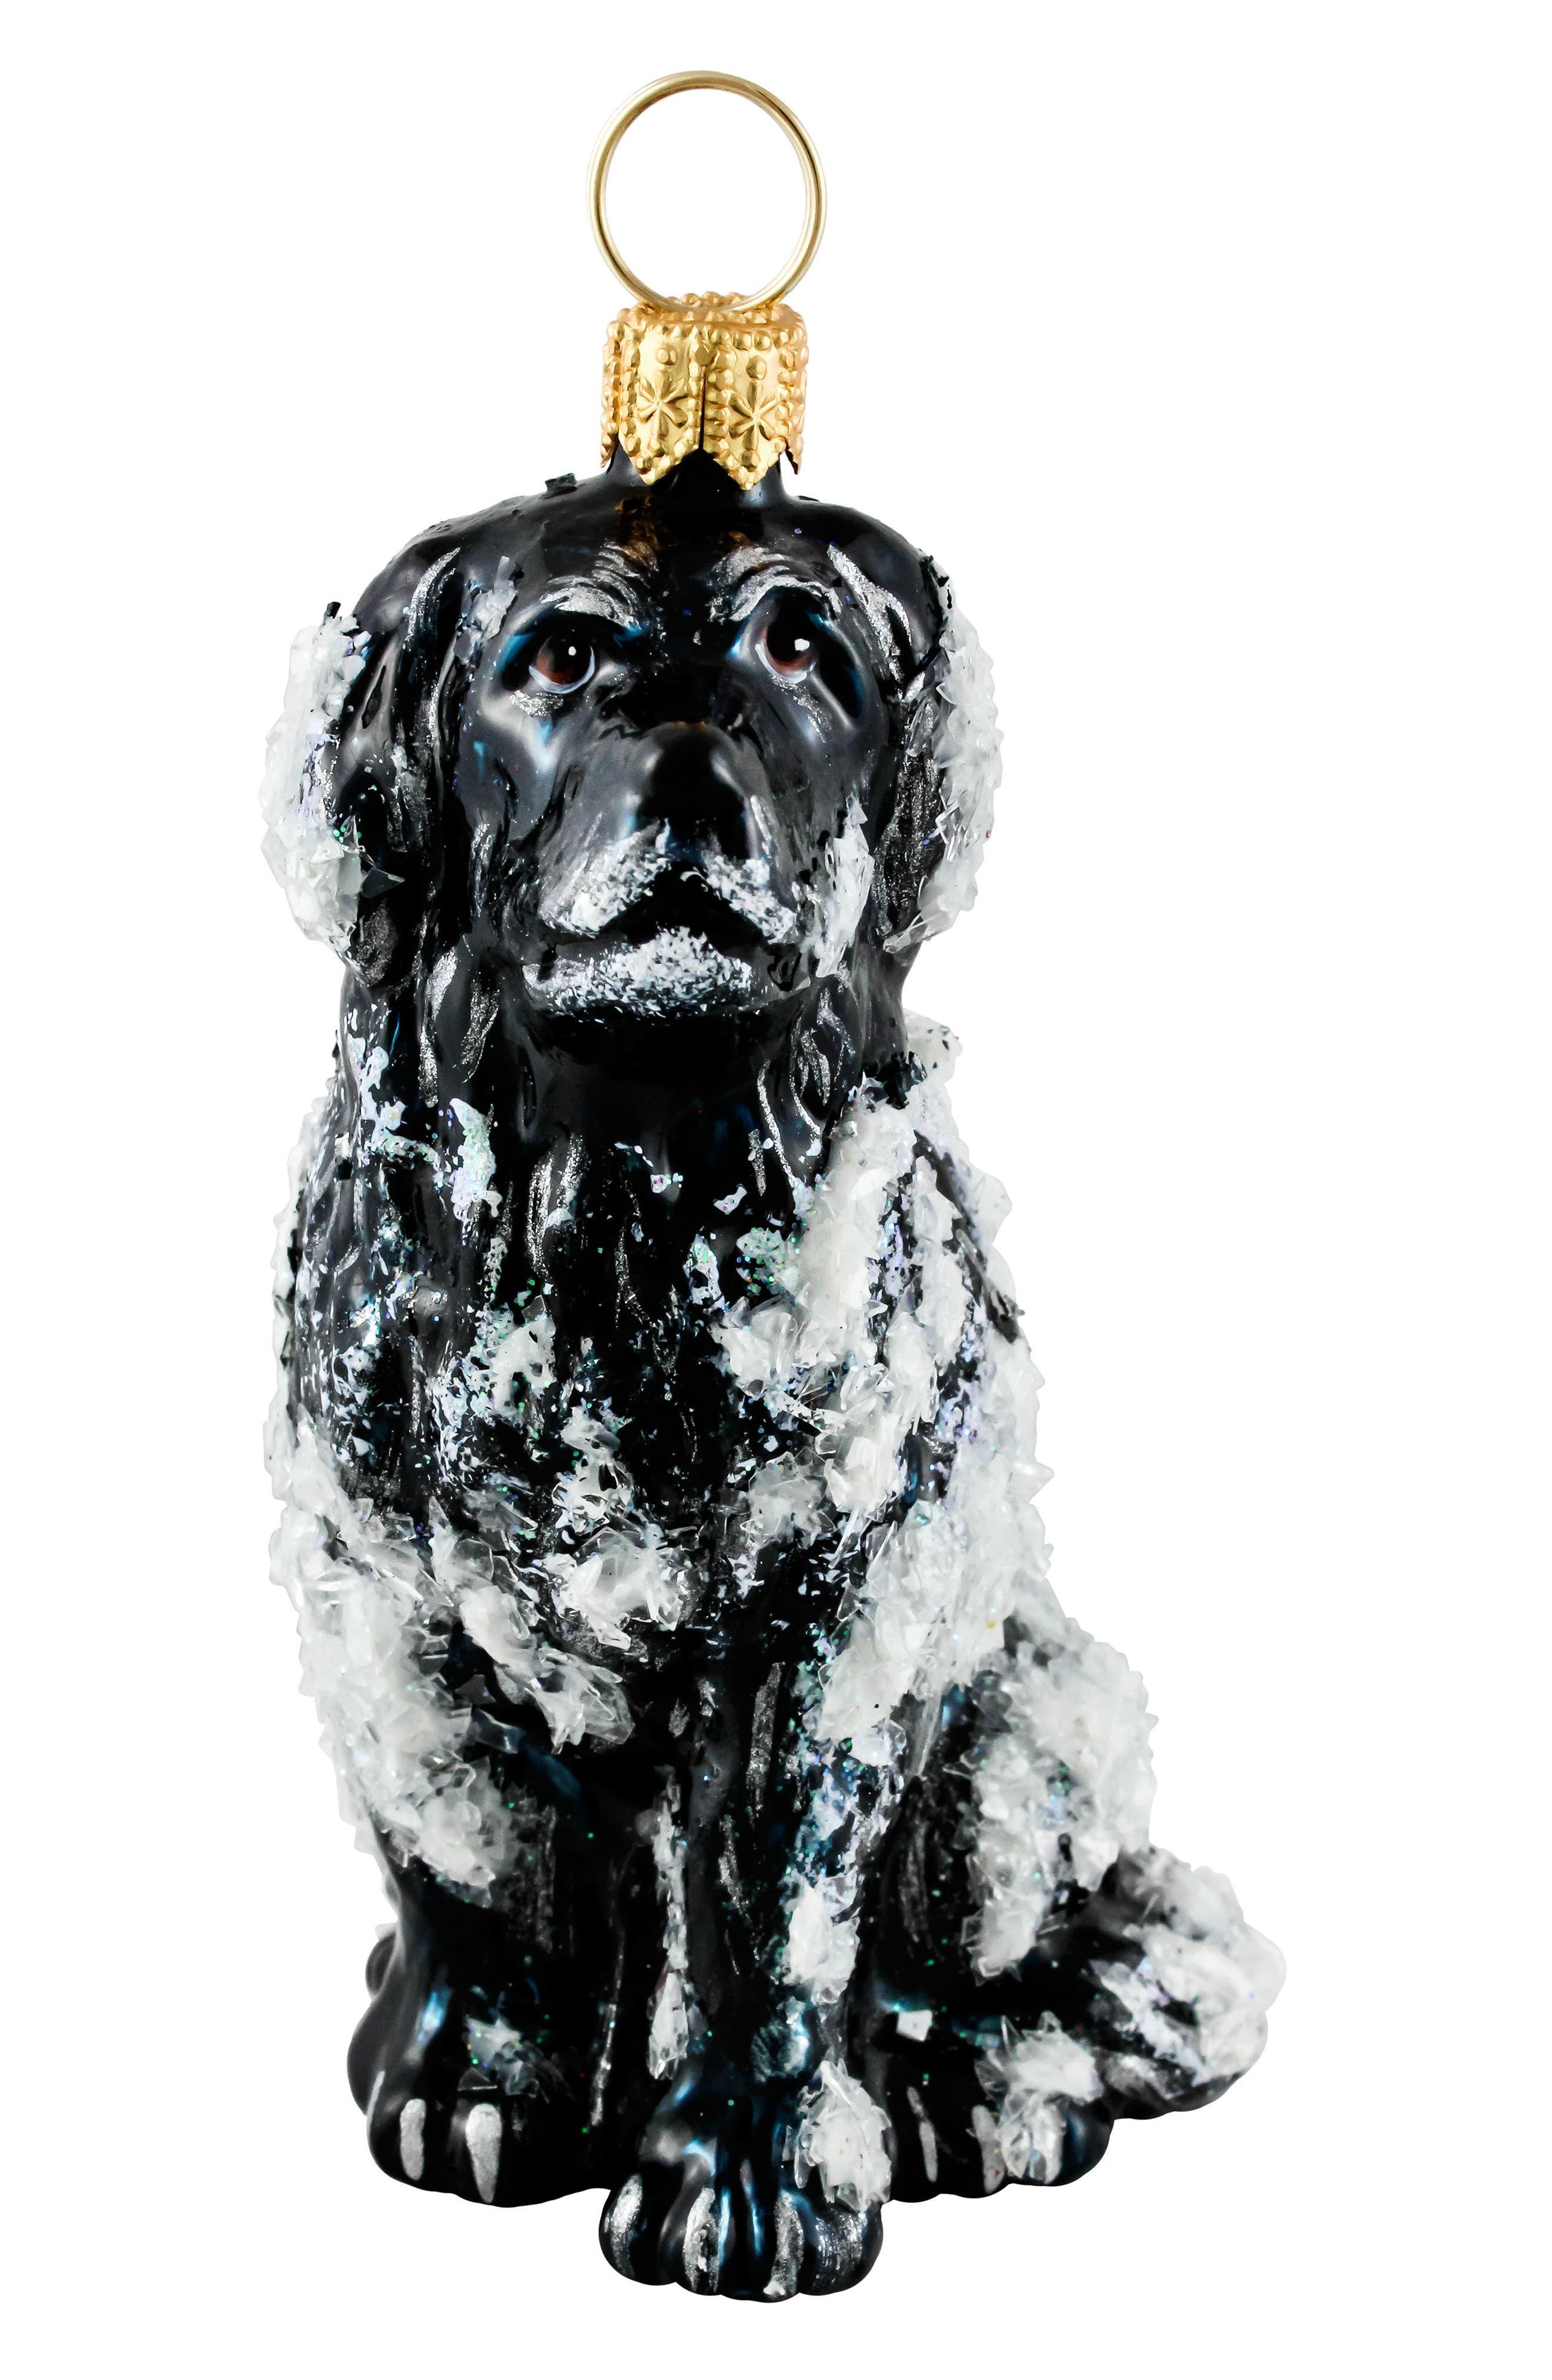 Snowy Newfoundland Dog Ornament,                             Main thumbnail 1, color,                             BLACK